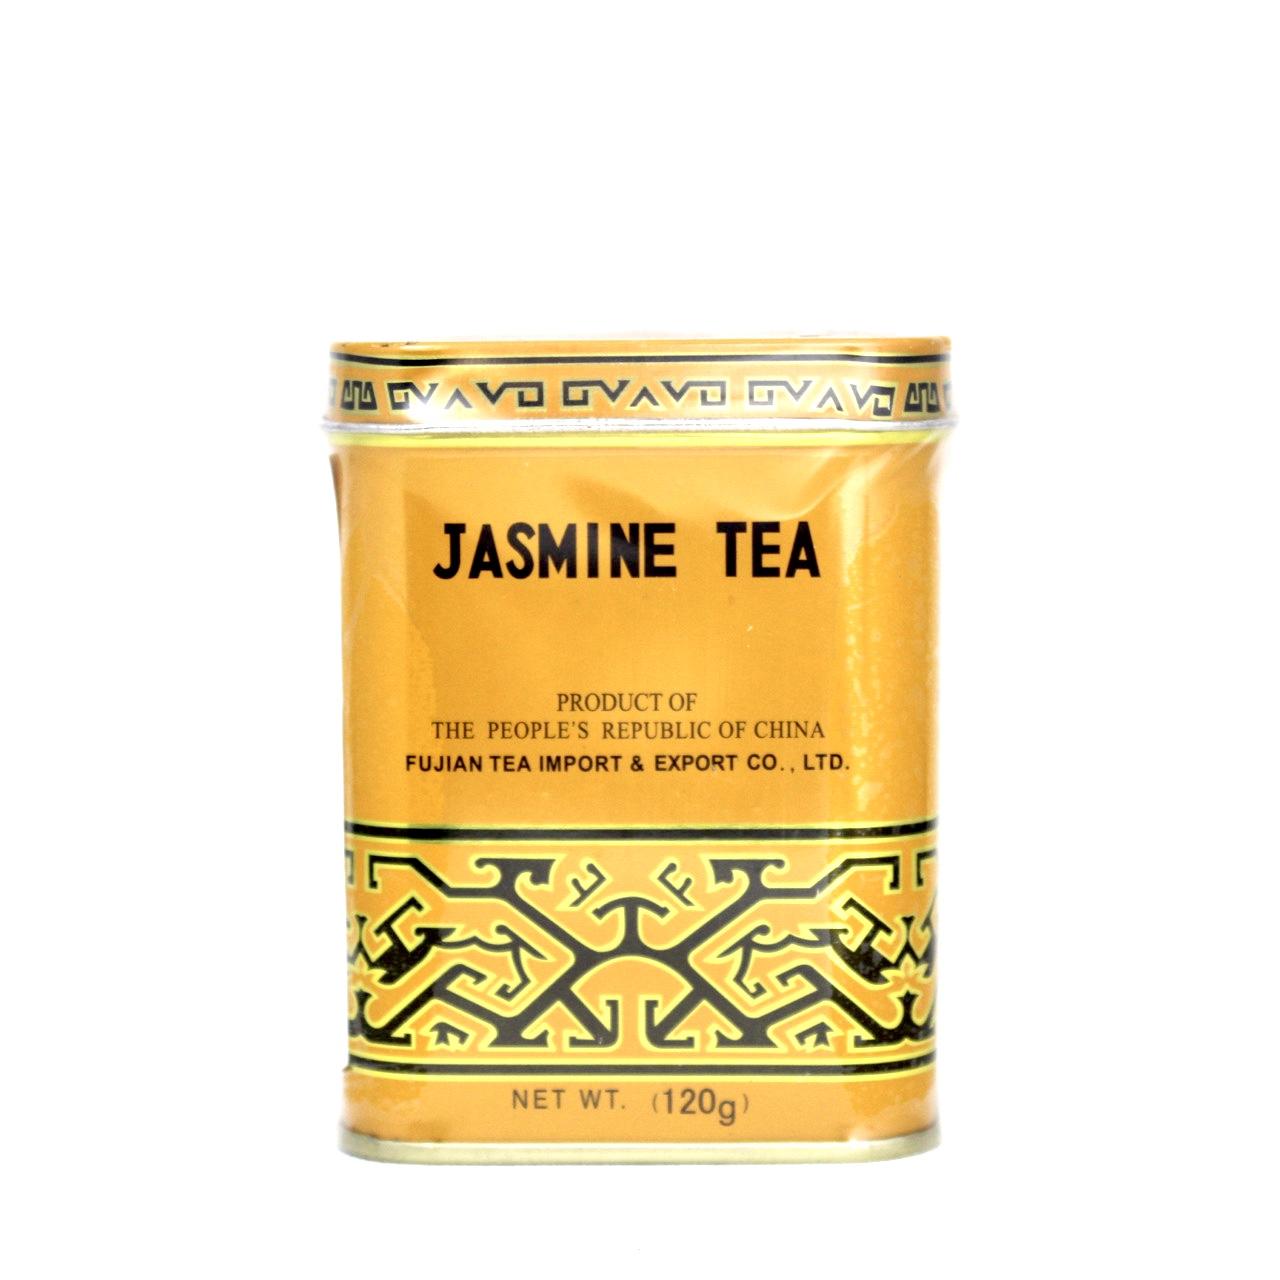 FUJIAN JASMINE TEA 120g LATA 1030